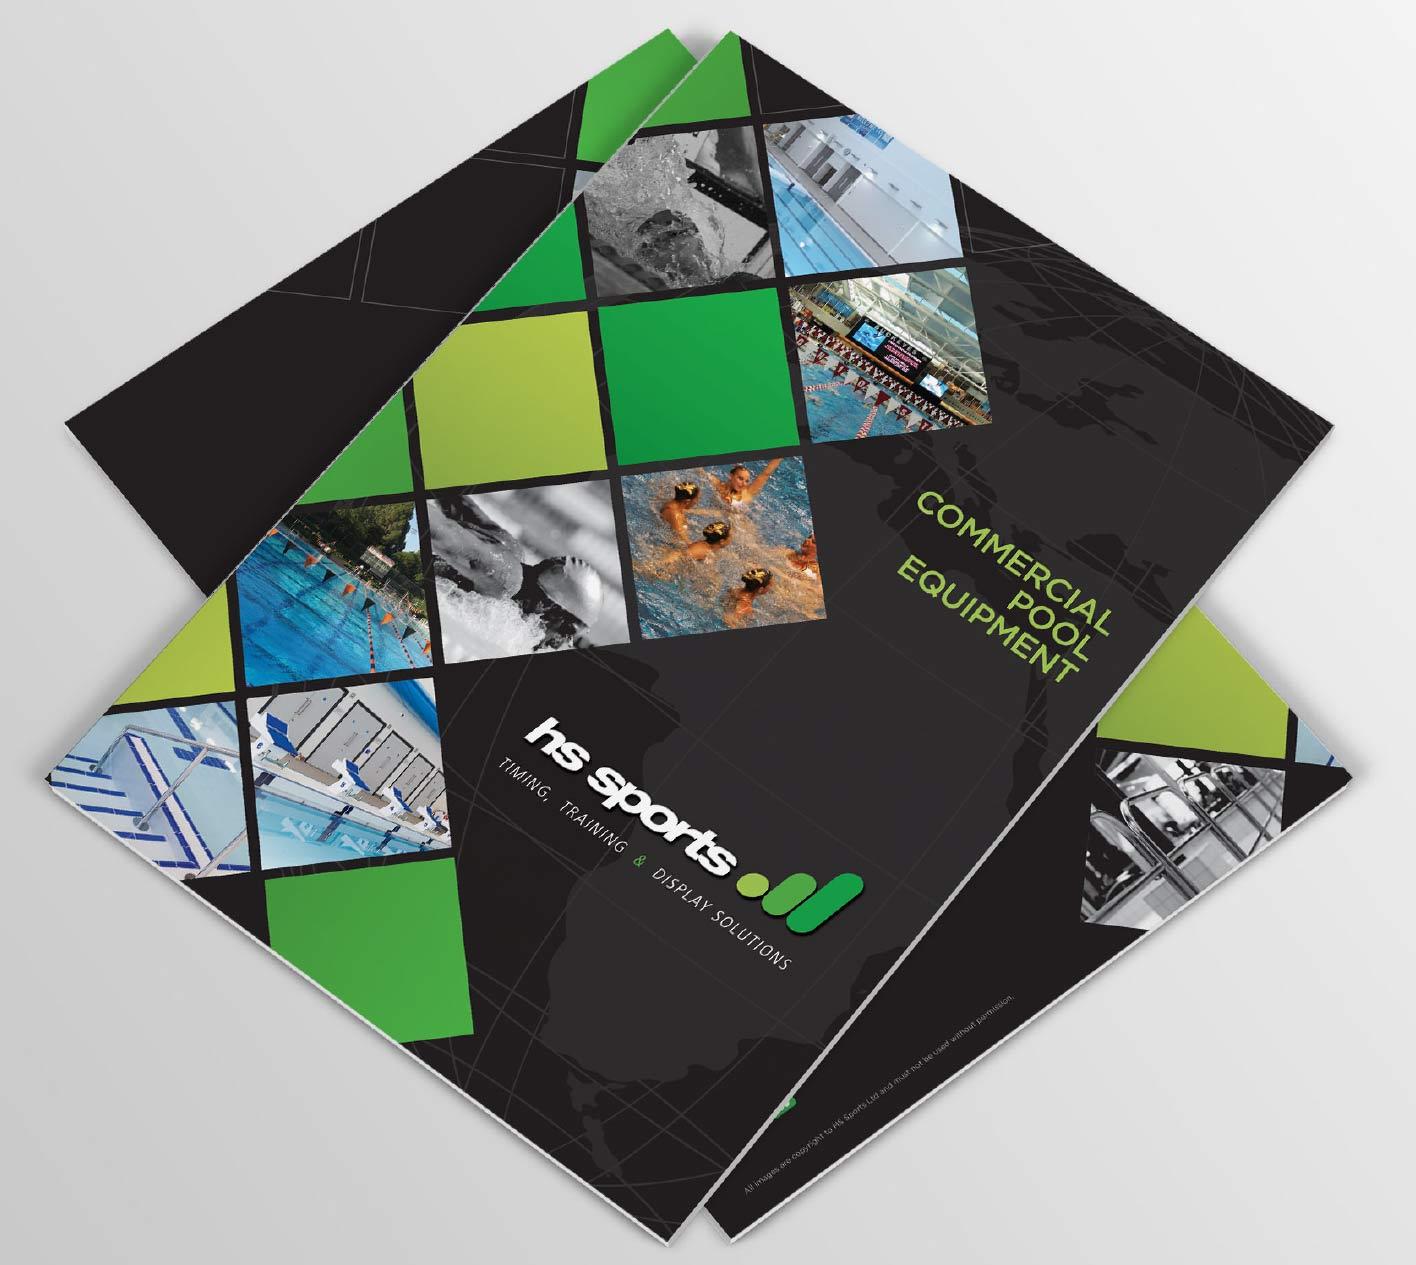 Brochure design & print for HS Sports, Congleton, Cheshire